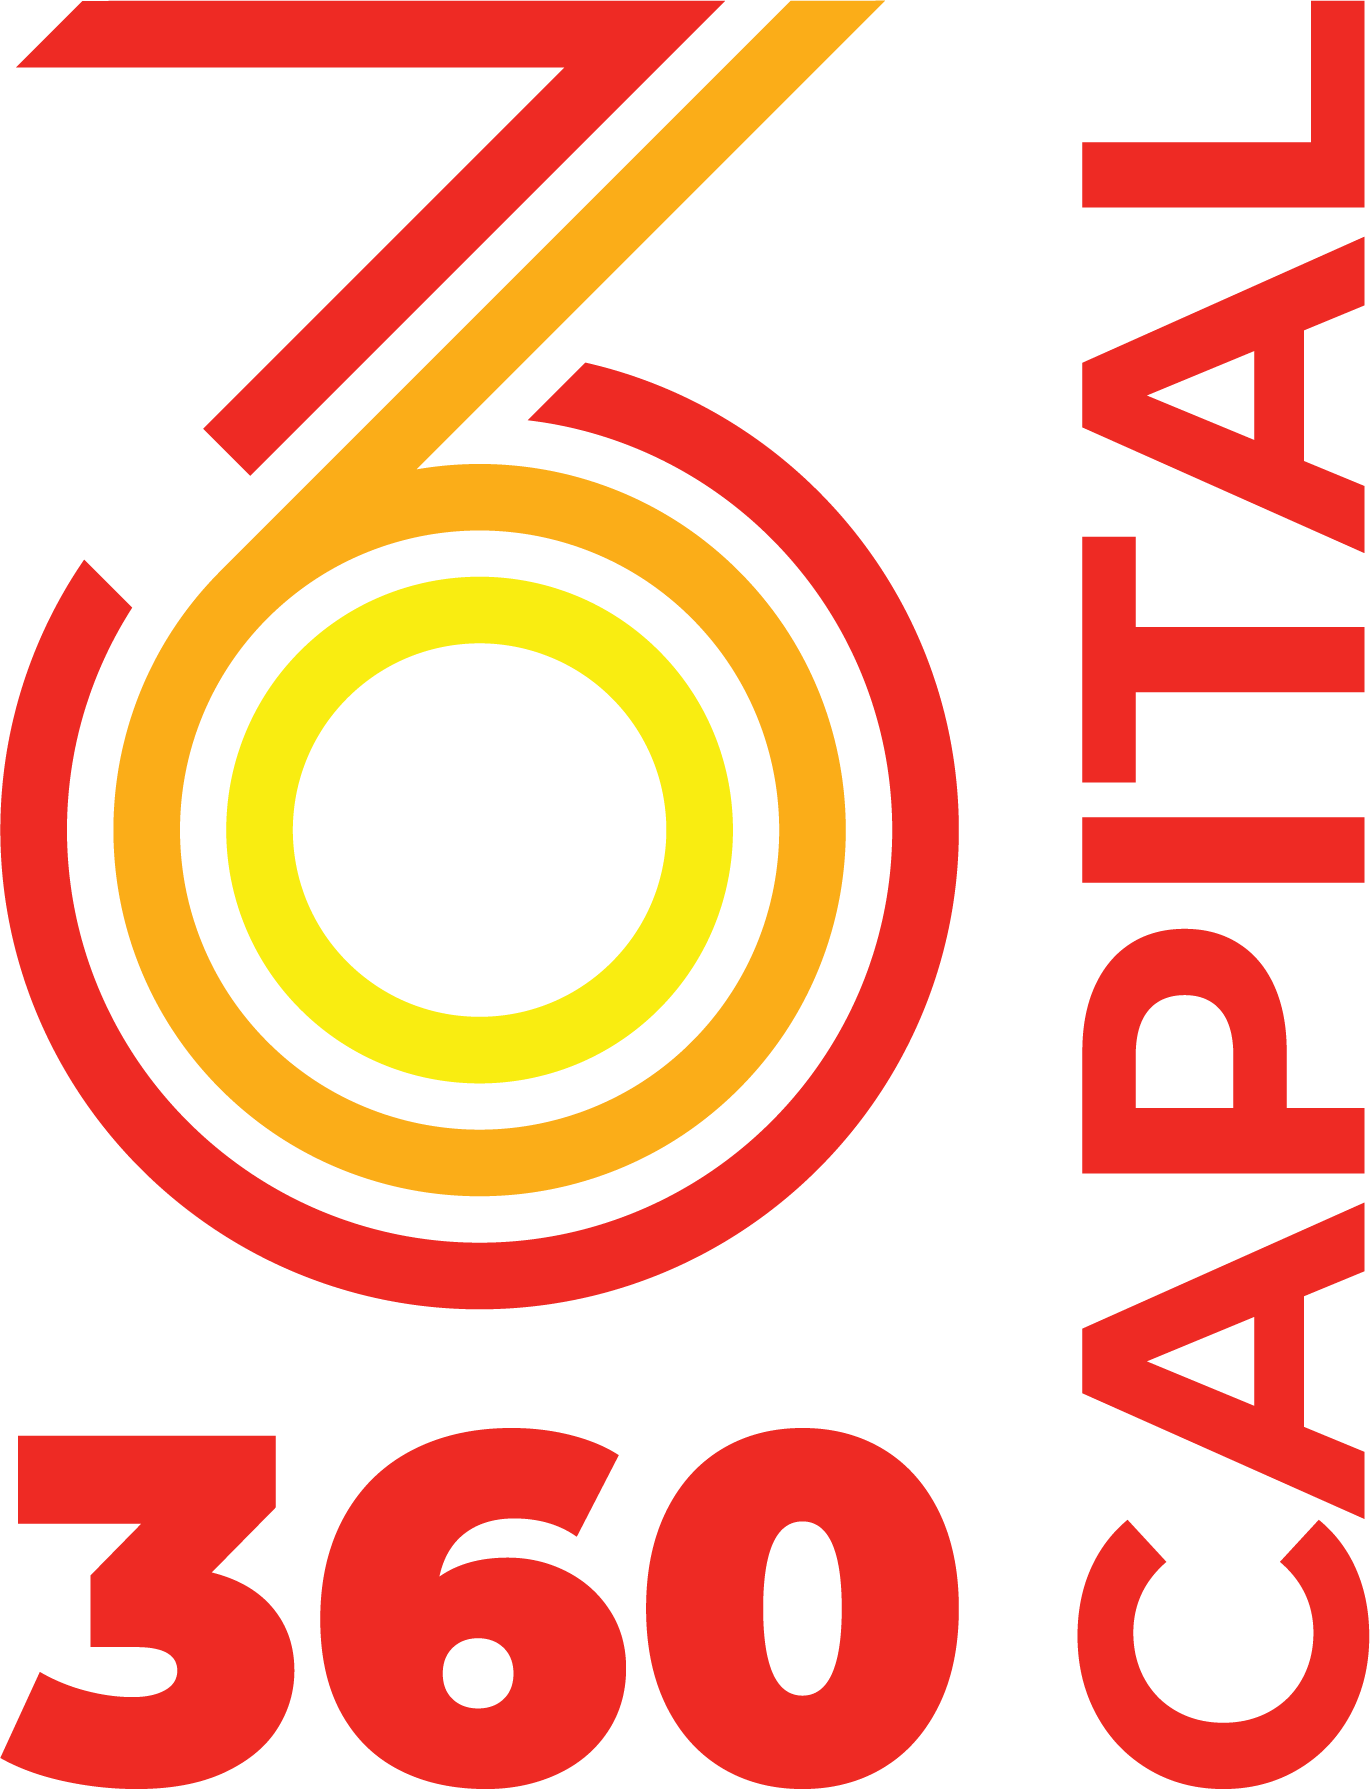 Capital 360